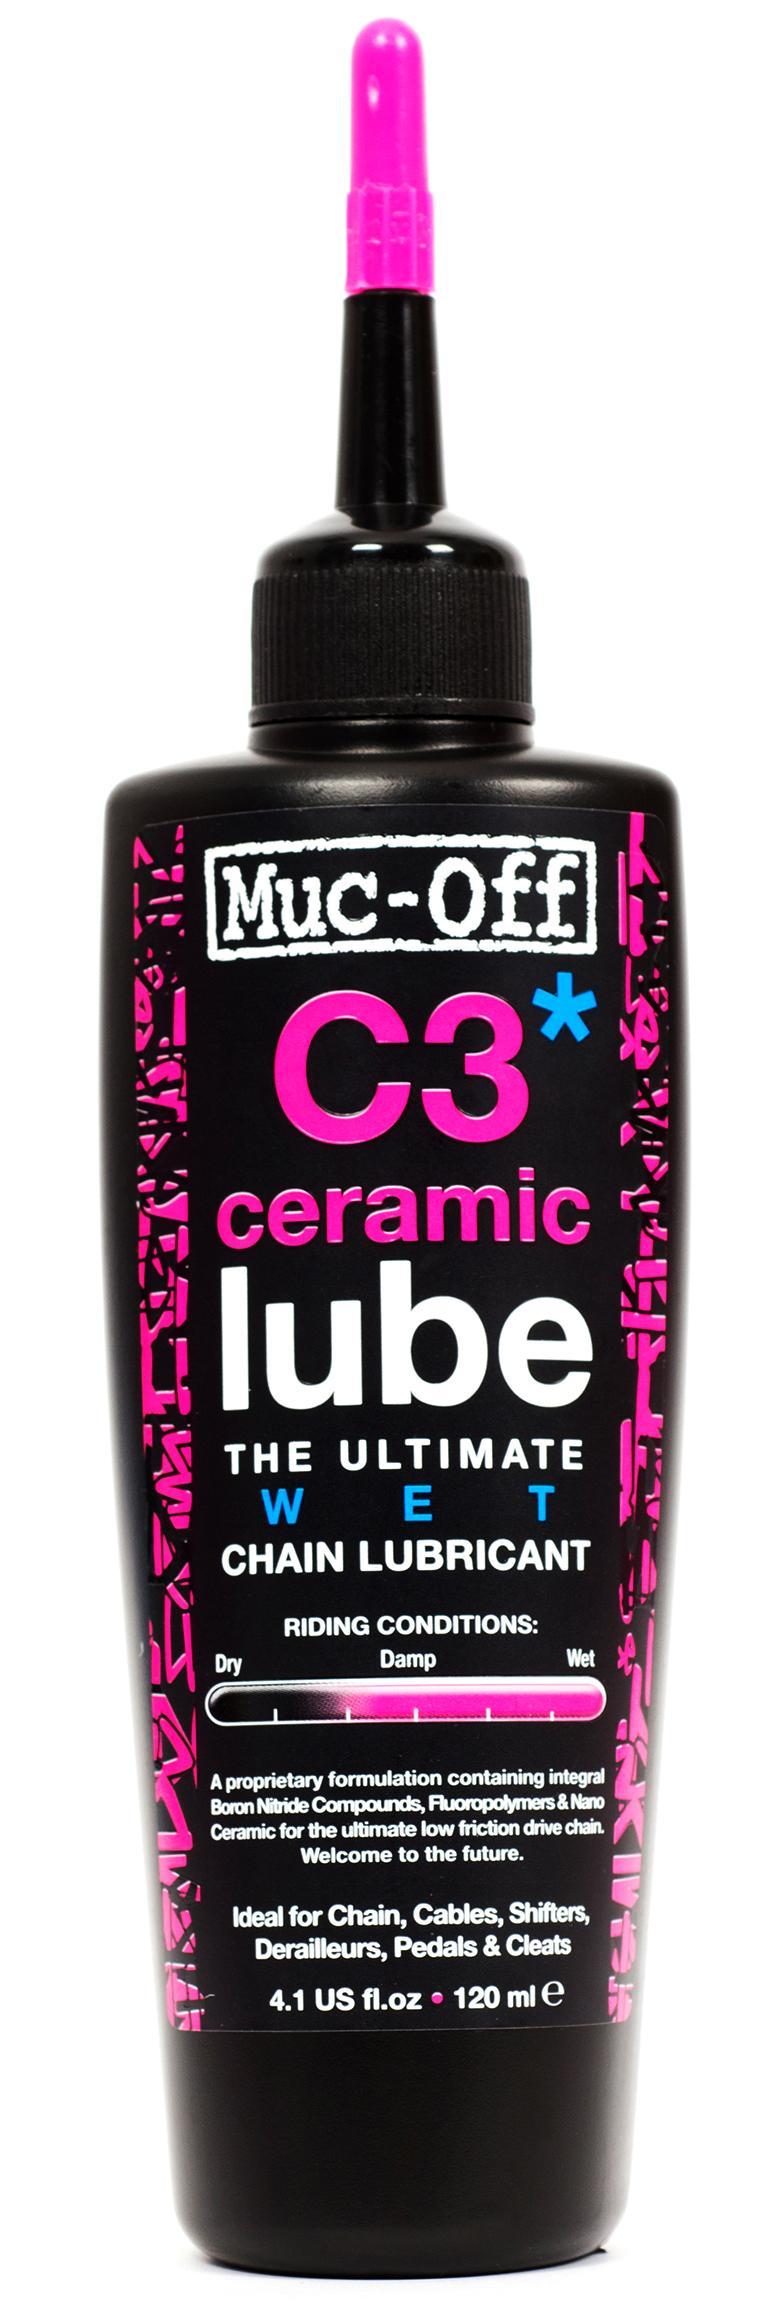 Muc Off C3 Ceramic Lube Wet Chain Lubricant 120ml